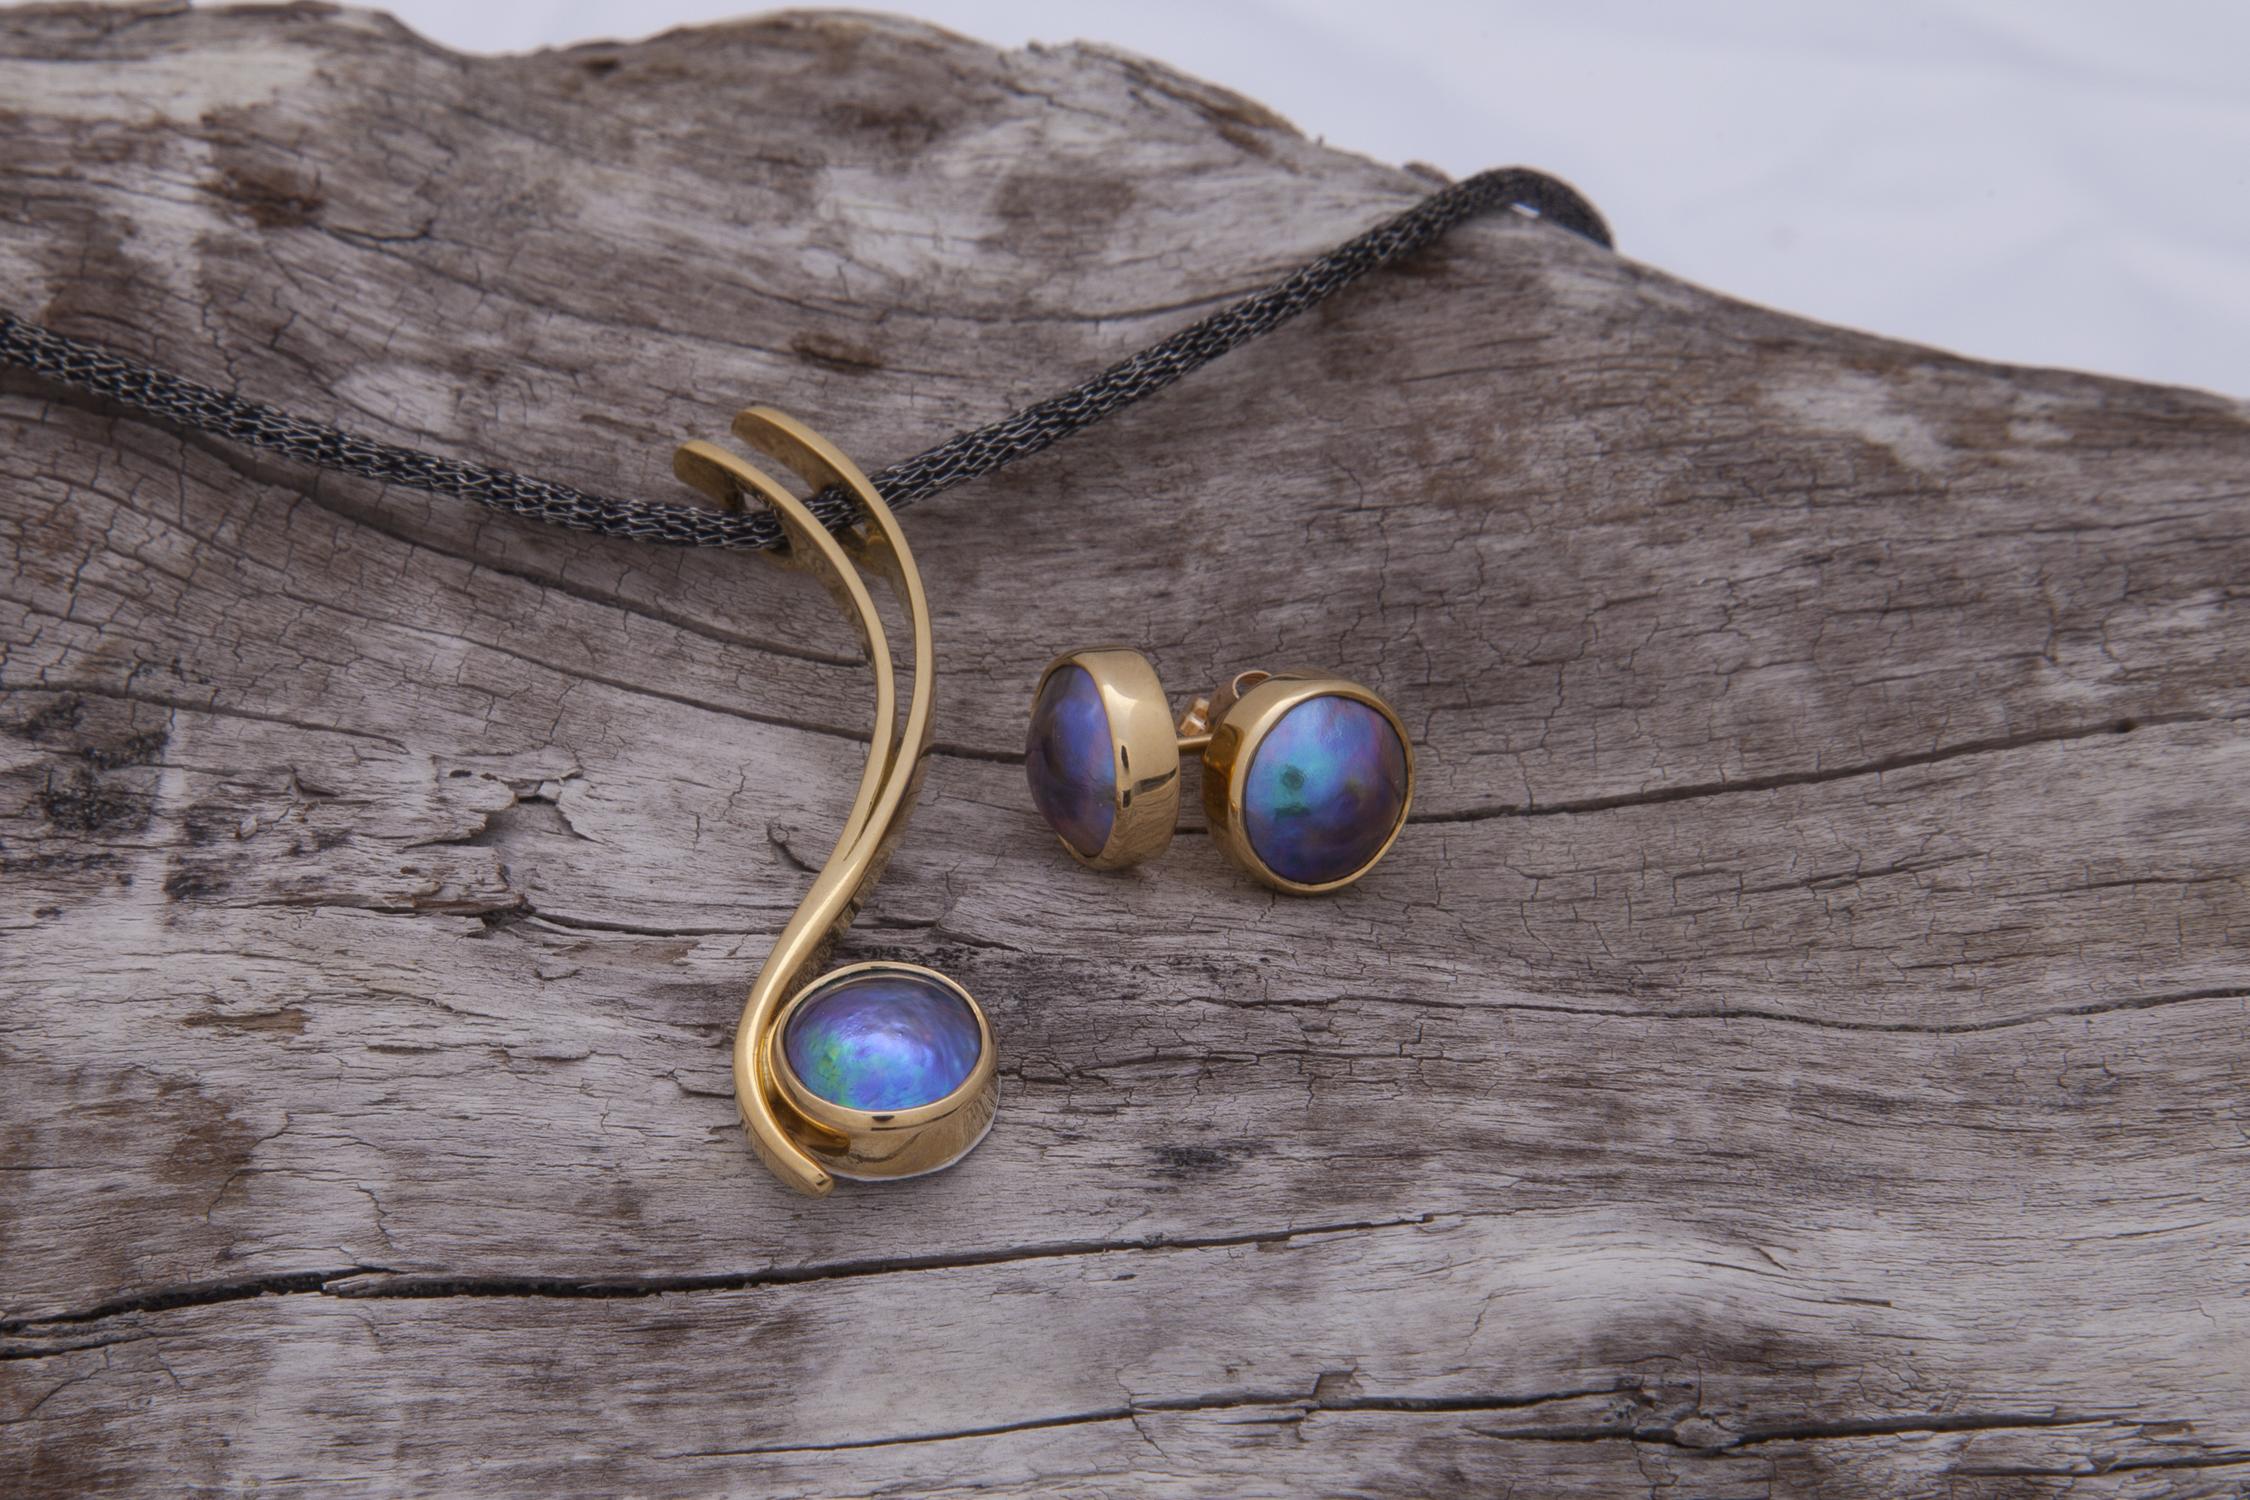 BLUE PEARLS GALLERY - Eyris Pearls